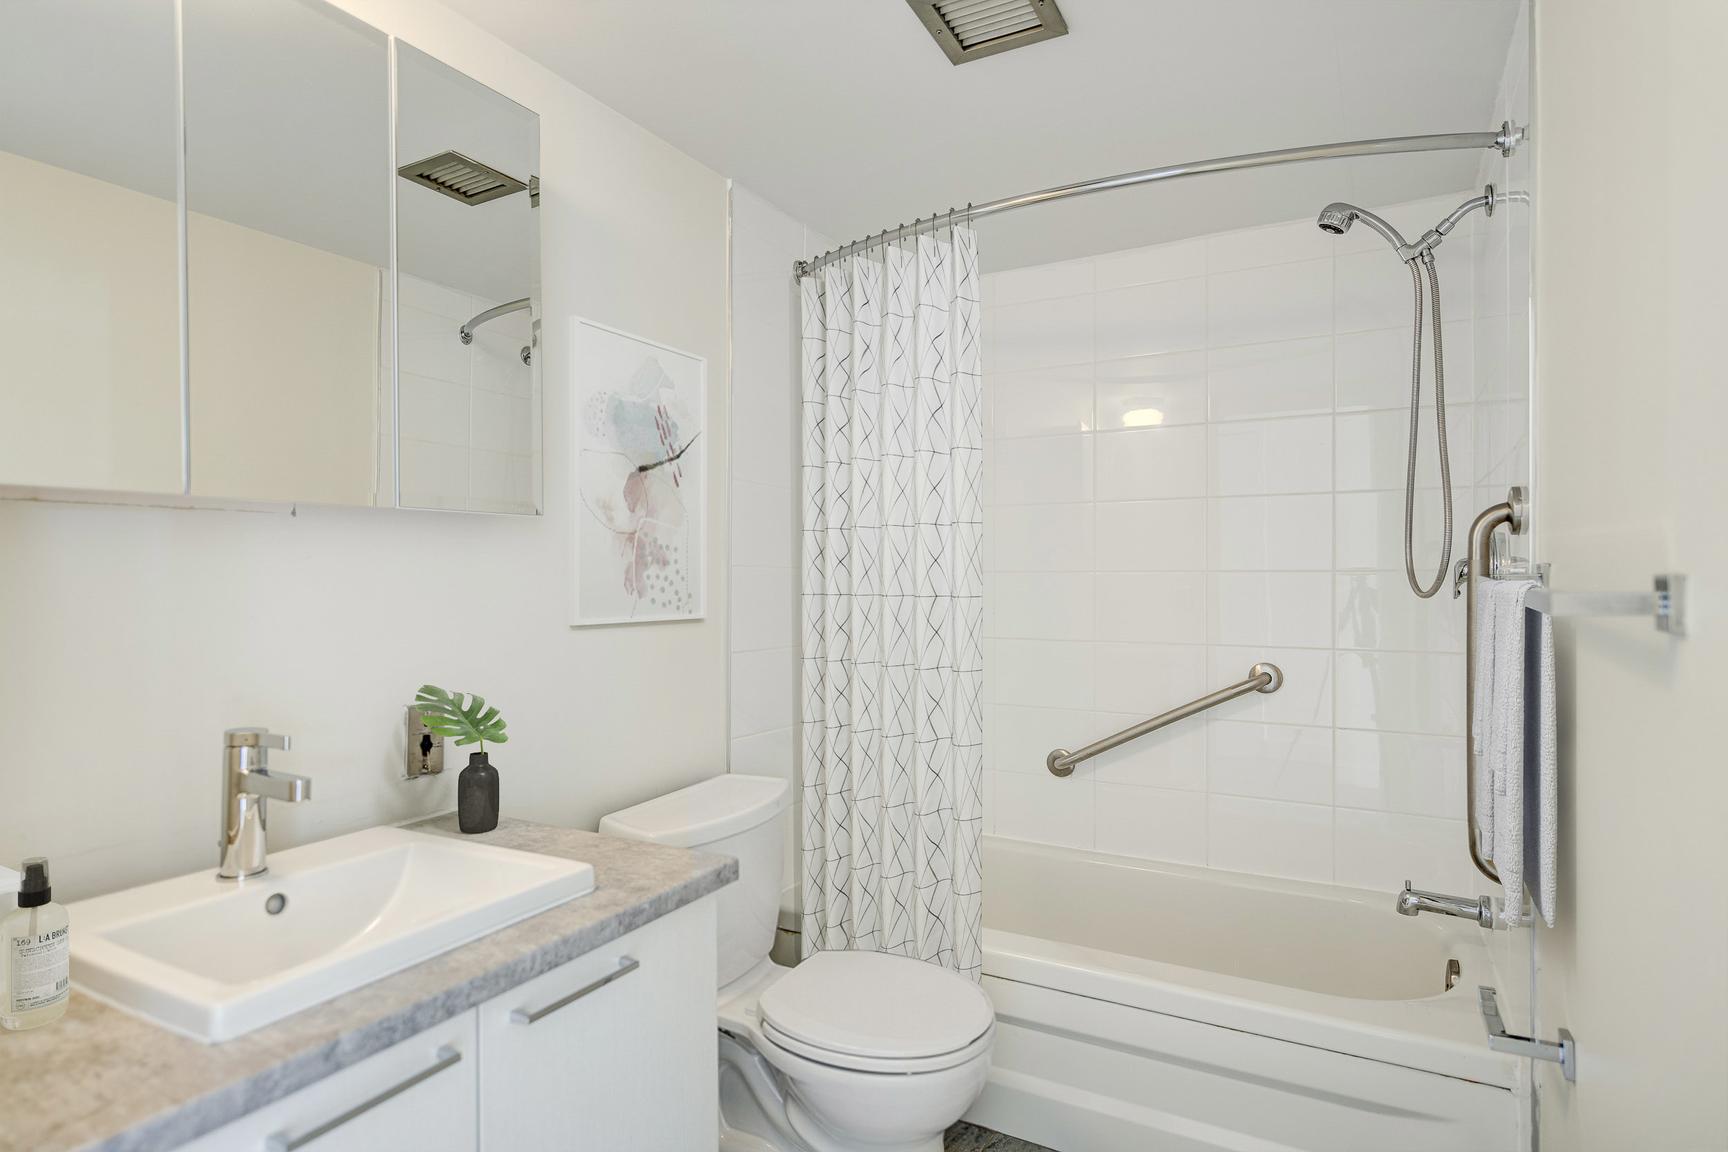 1 bedroom Apartments for rent in Laval at Le Quatre Cent - Photo 10 - RentQuebecApartments – L407184